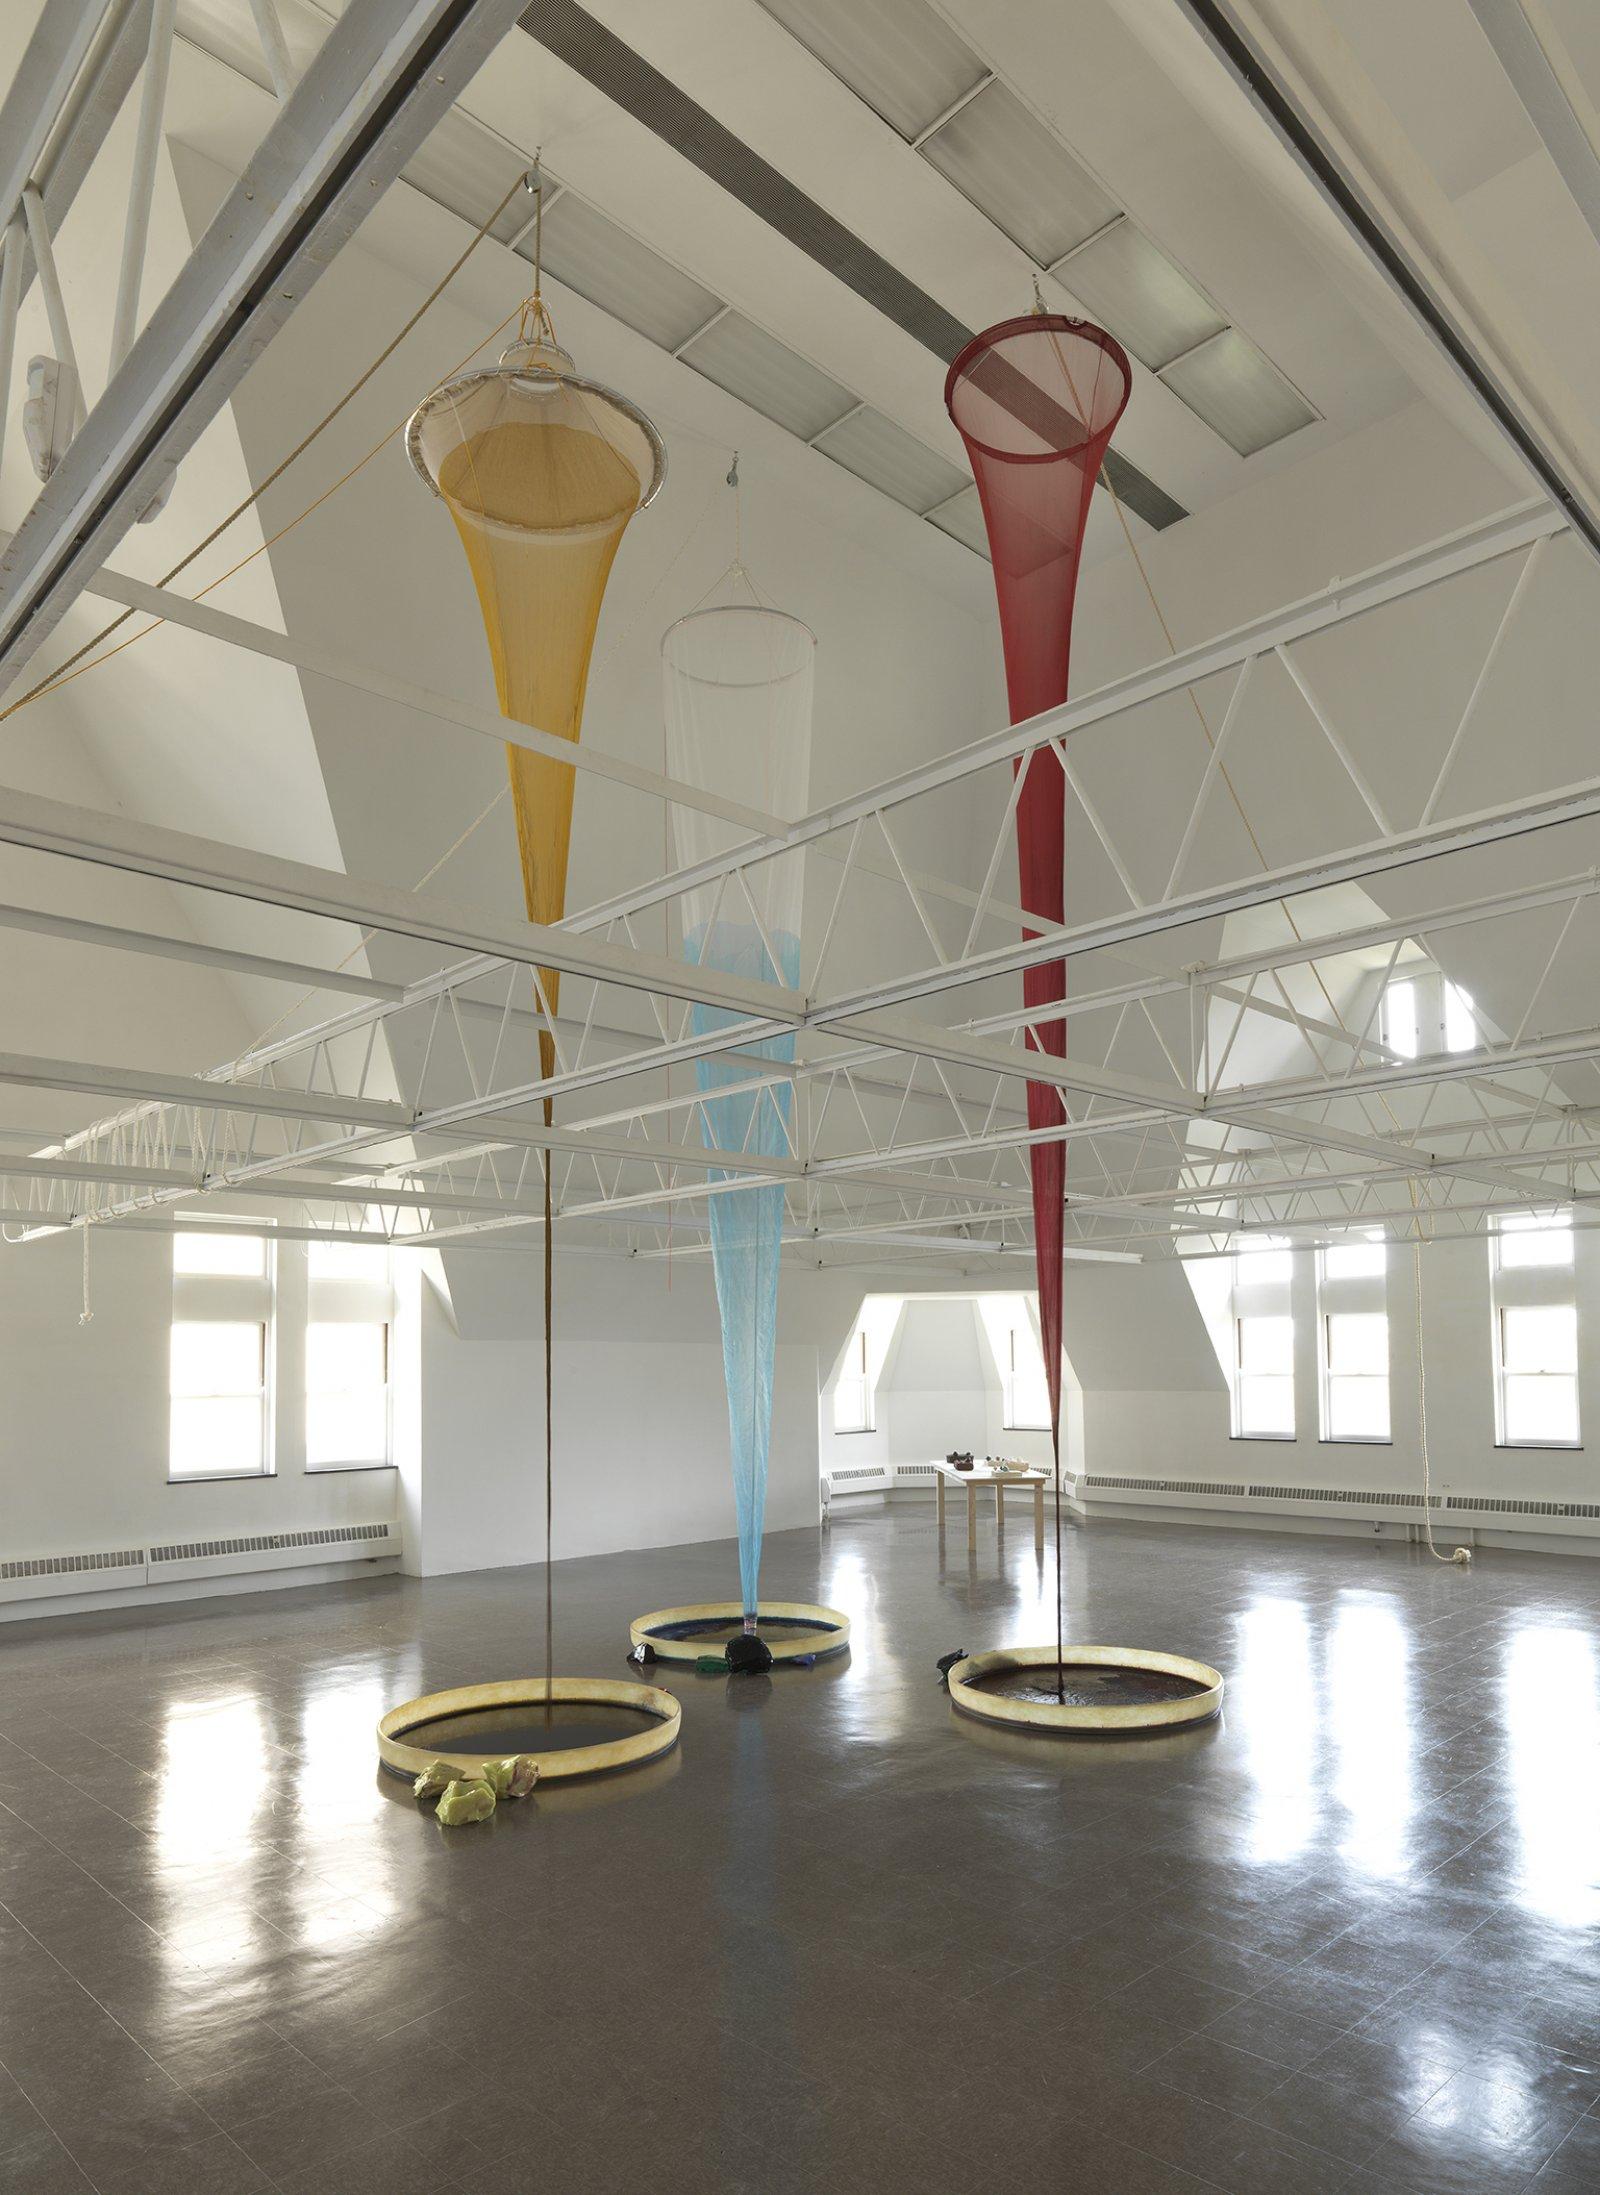 Christina Mackie, Colour Drop, 2014, mixed media, dimensions variable by Christina Mackie